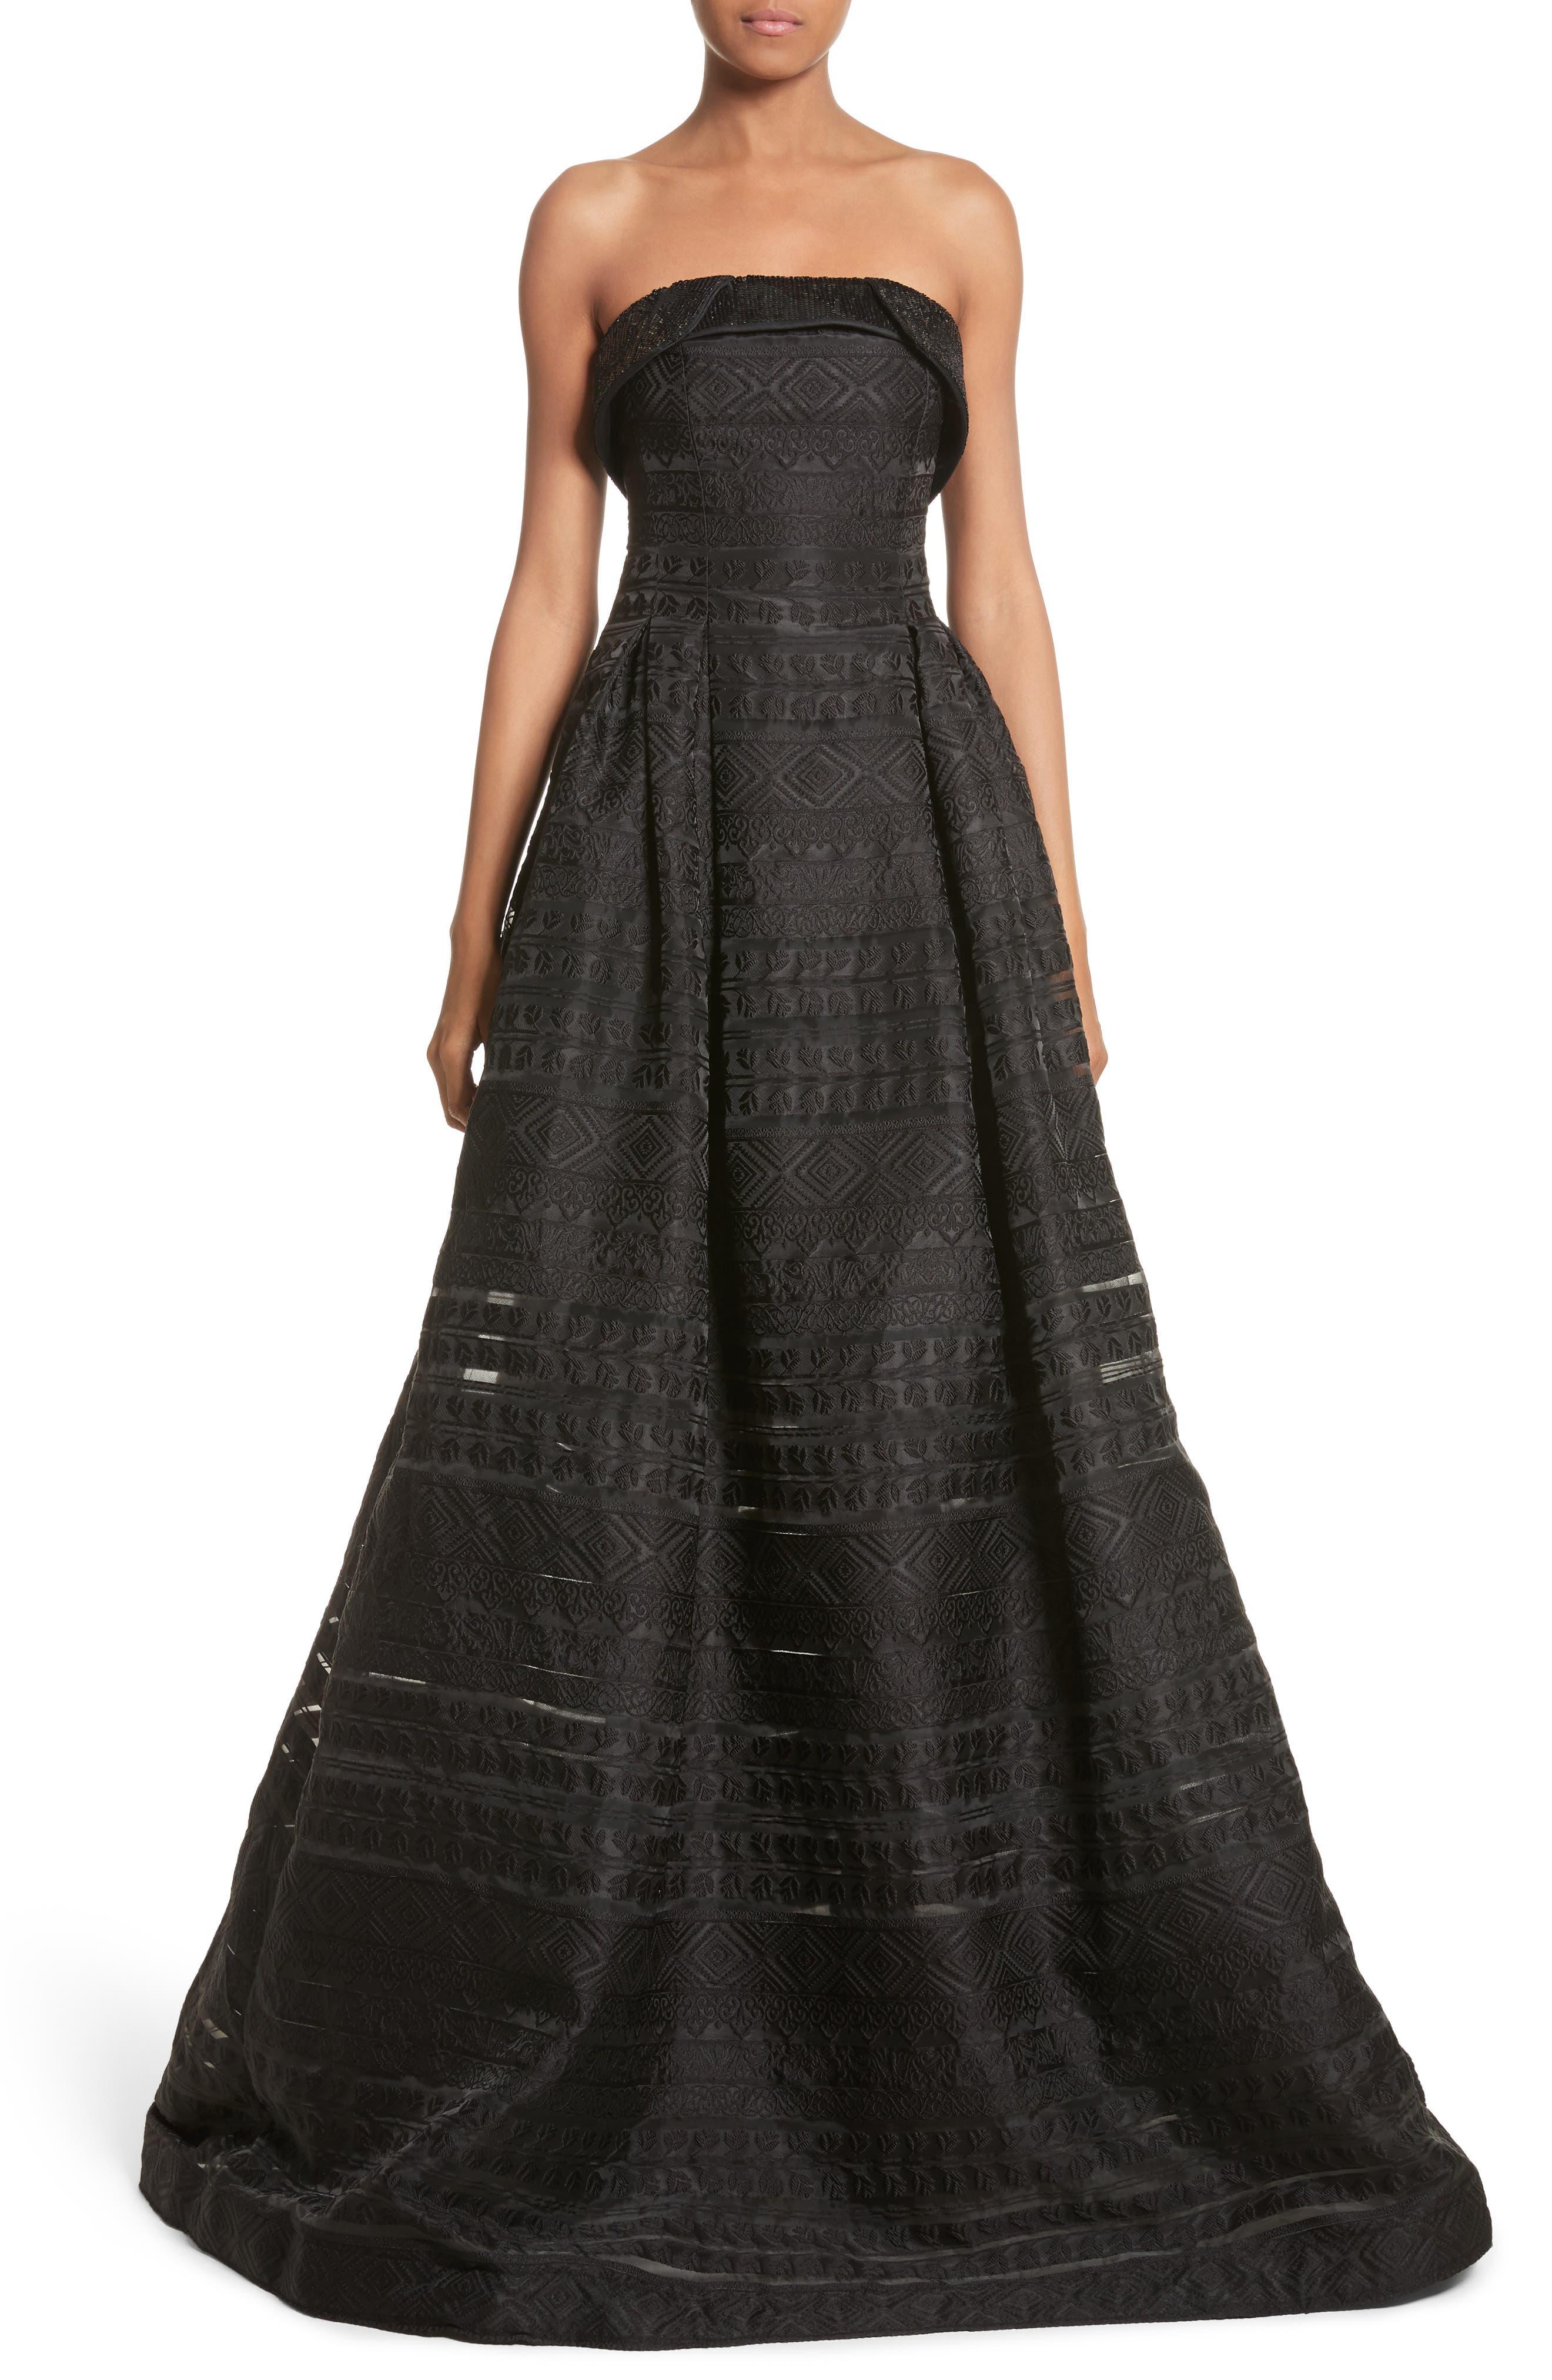 Noir Istiklal Embellished Strapless Ballgown,                         Main,                         color, 001